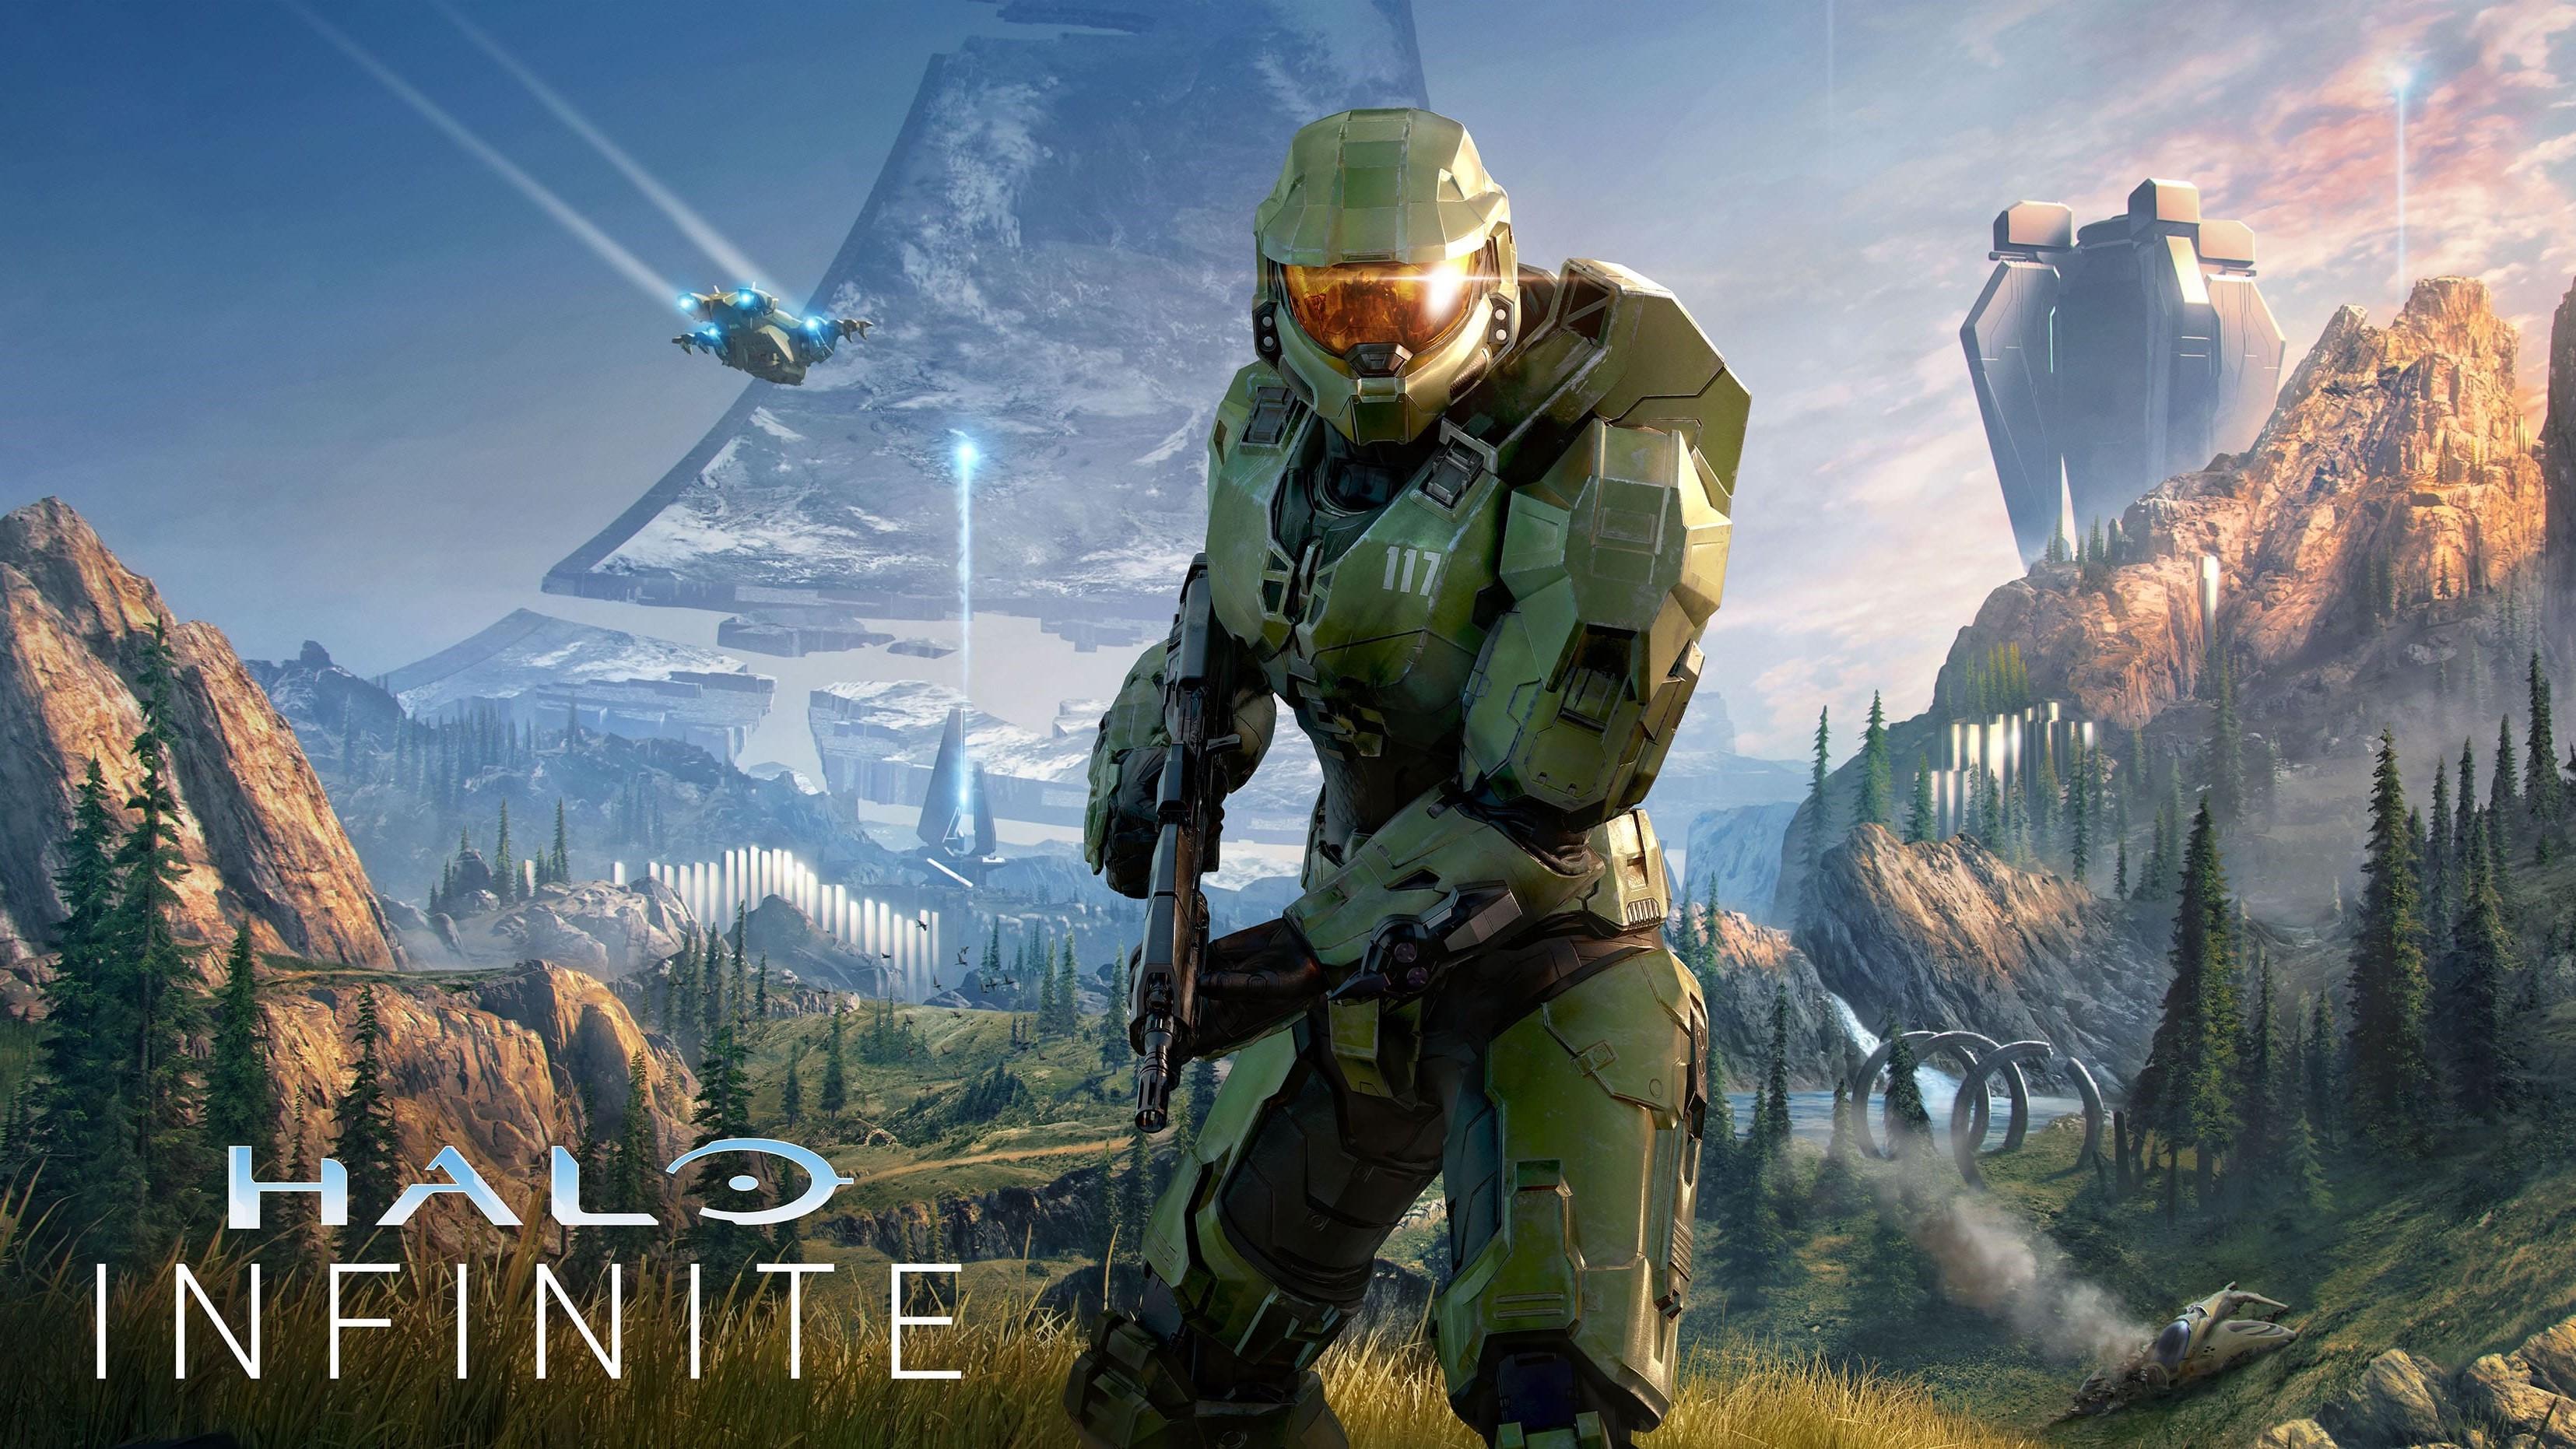 Halo Infinite release date, gameplay, trailer and news | TechRadar